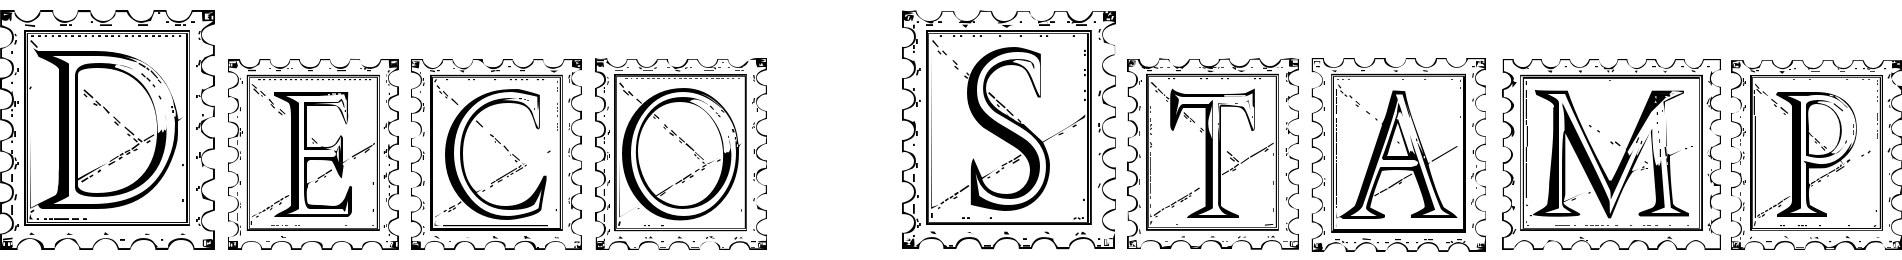 Deco Stamp